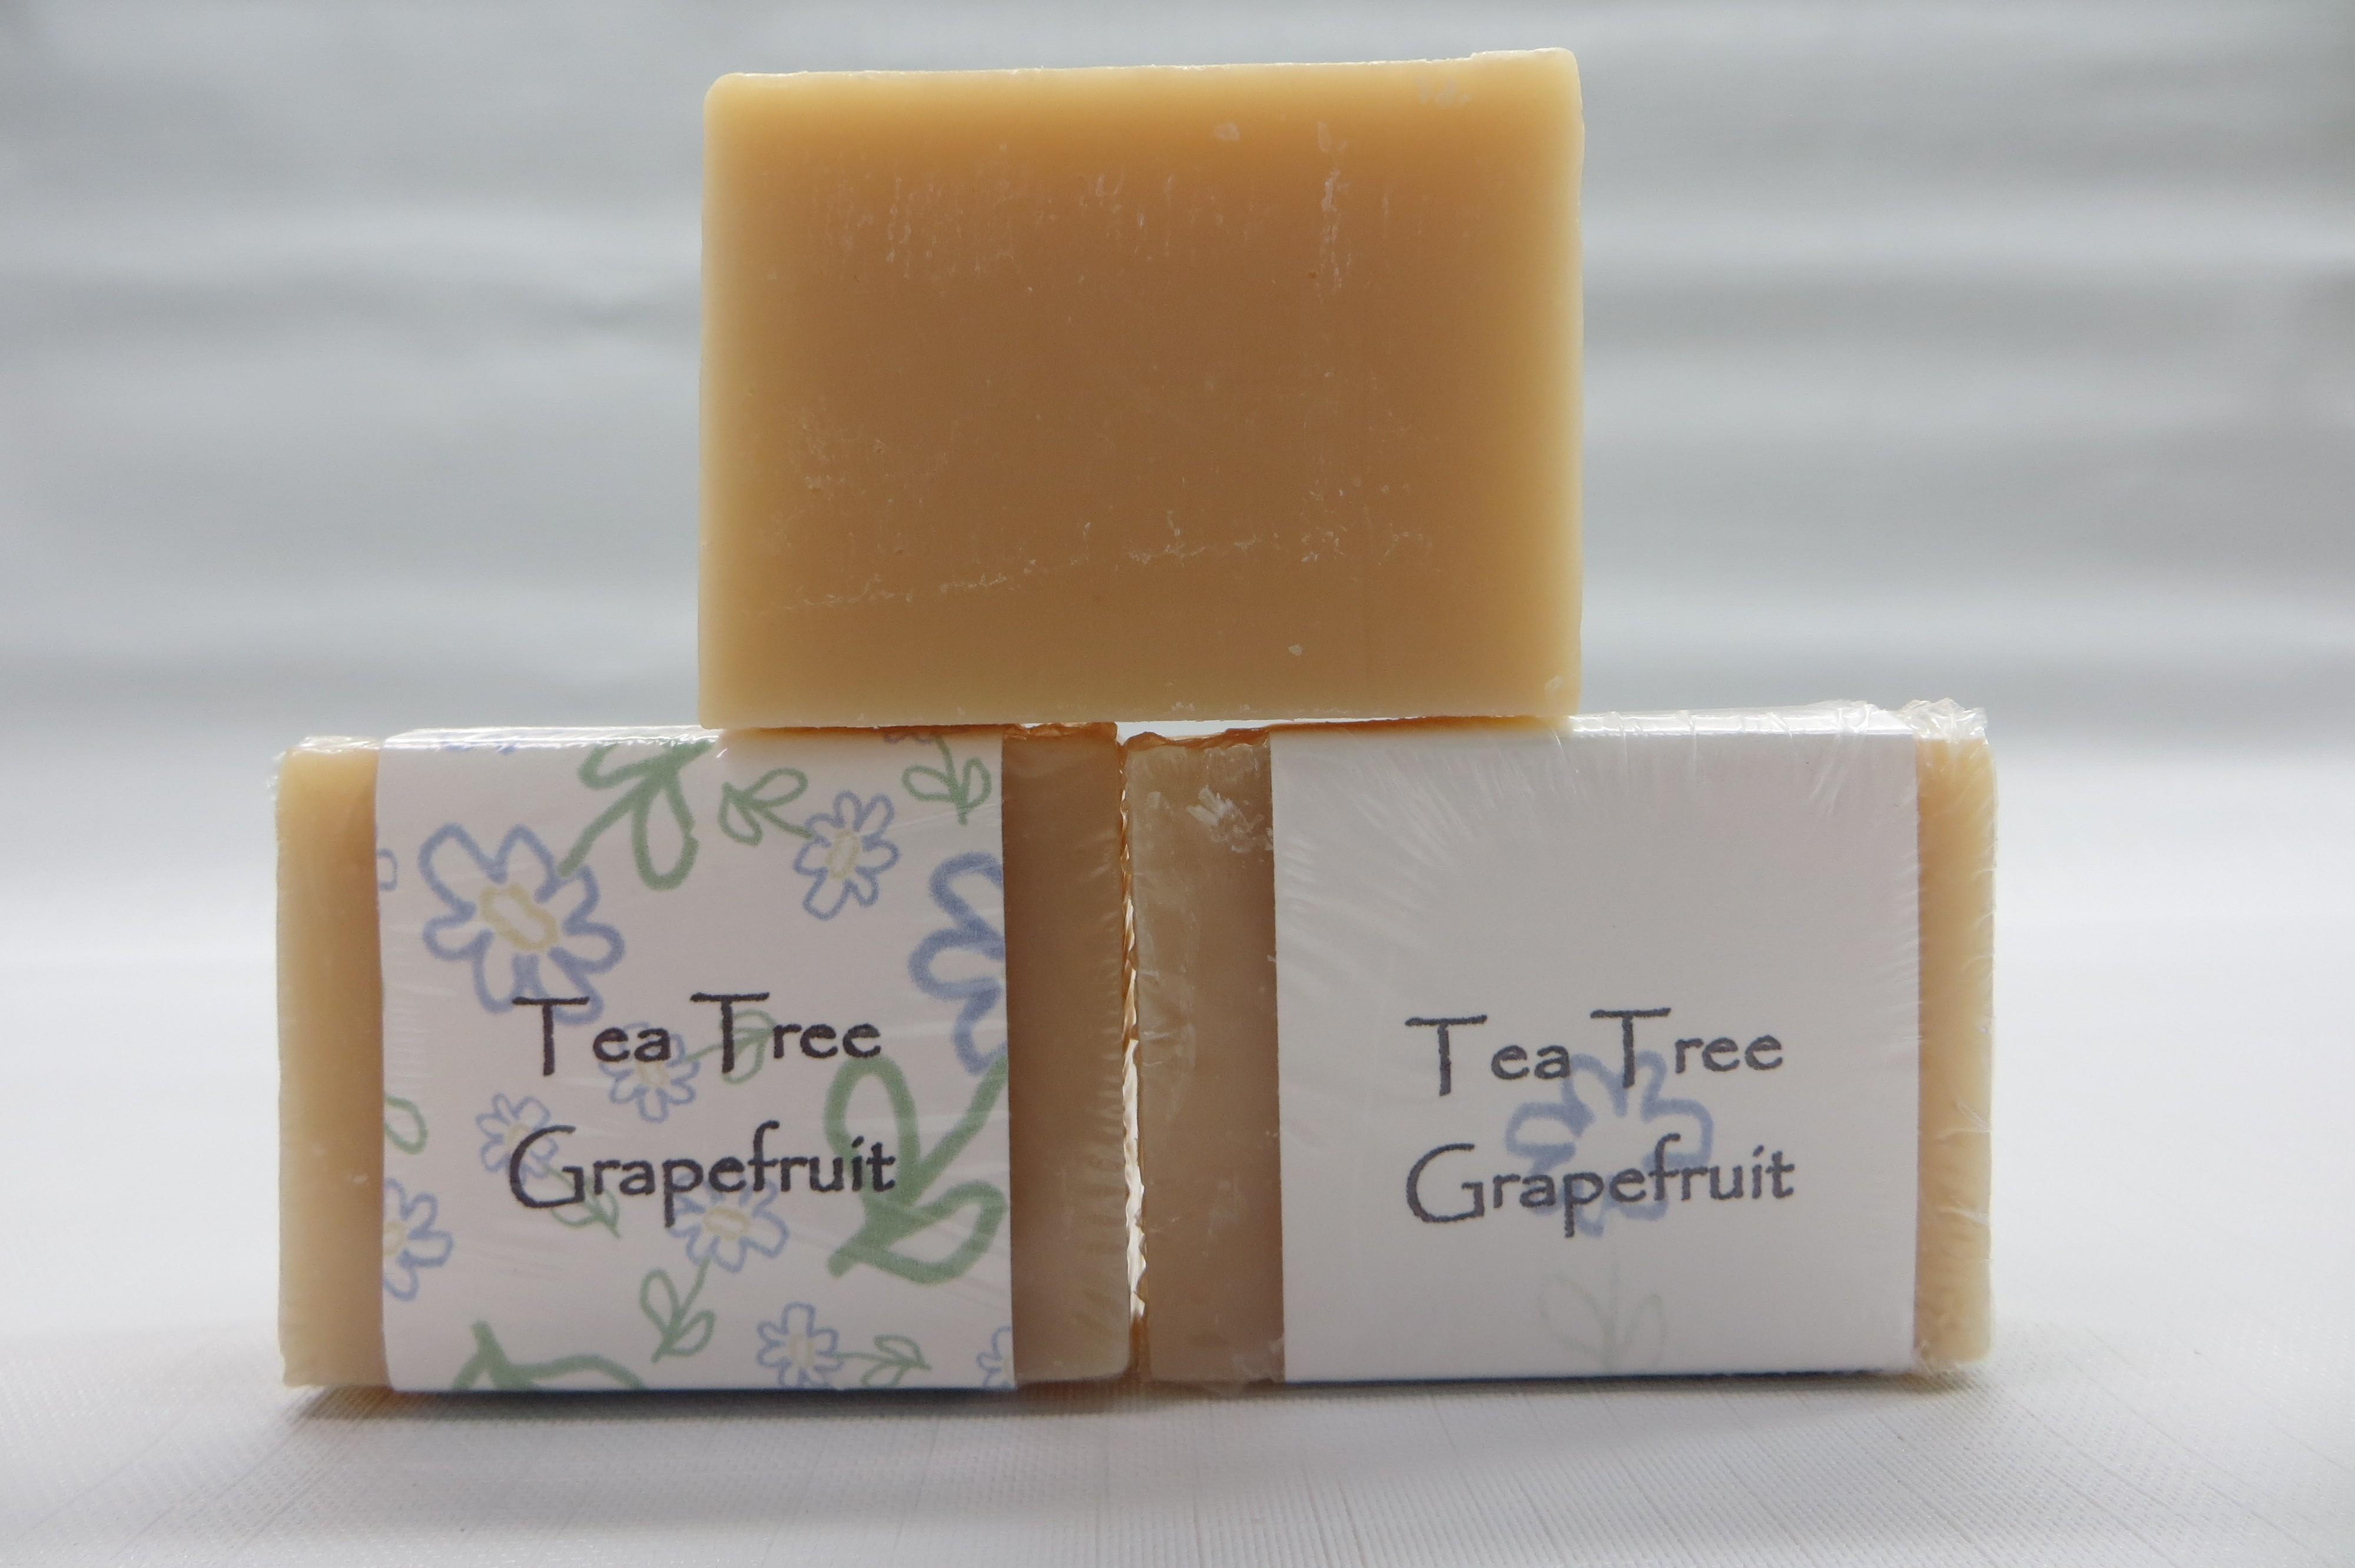 Tea Tree Grapefruit